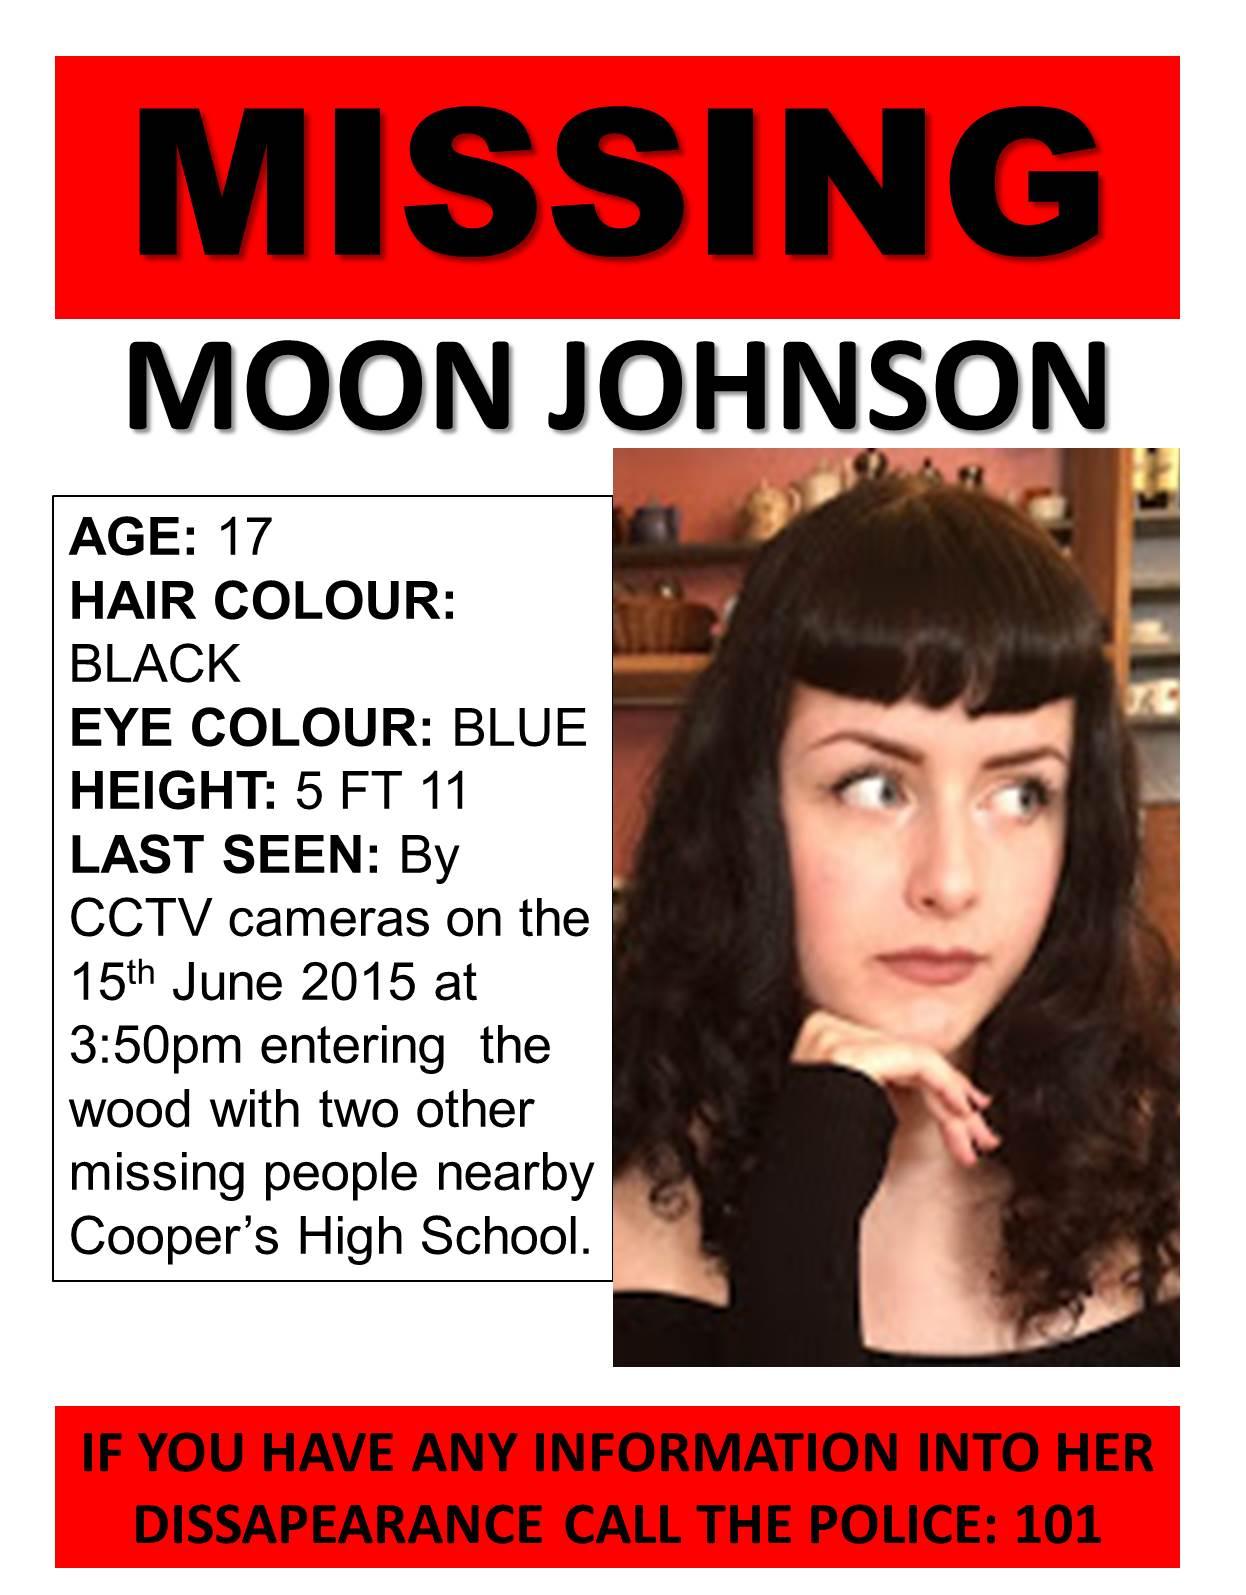 Missing poster generator